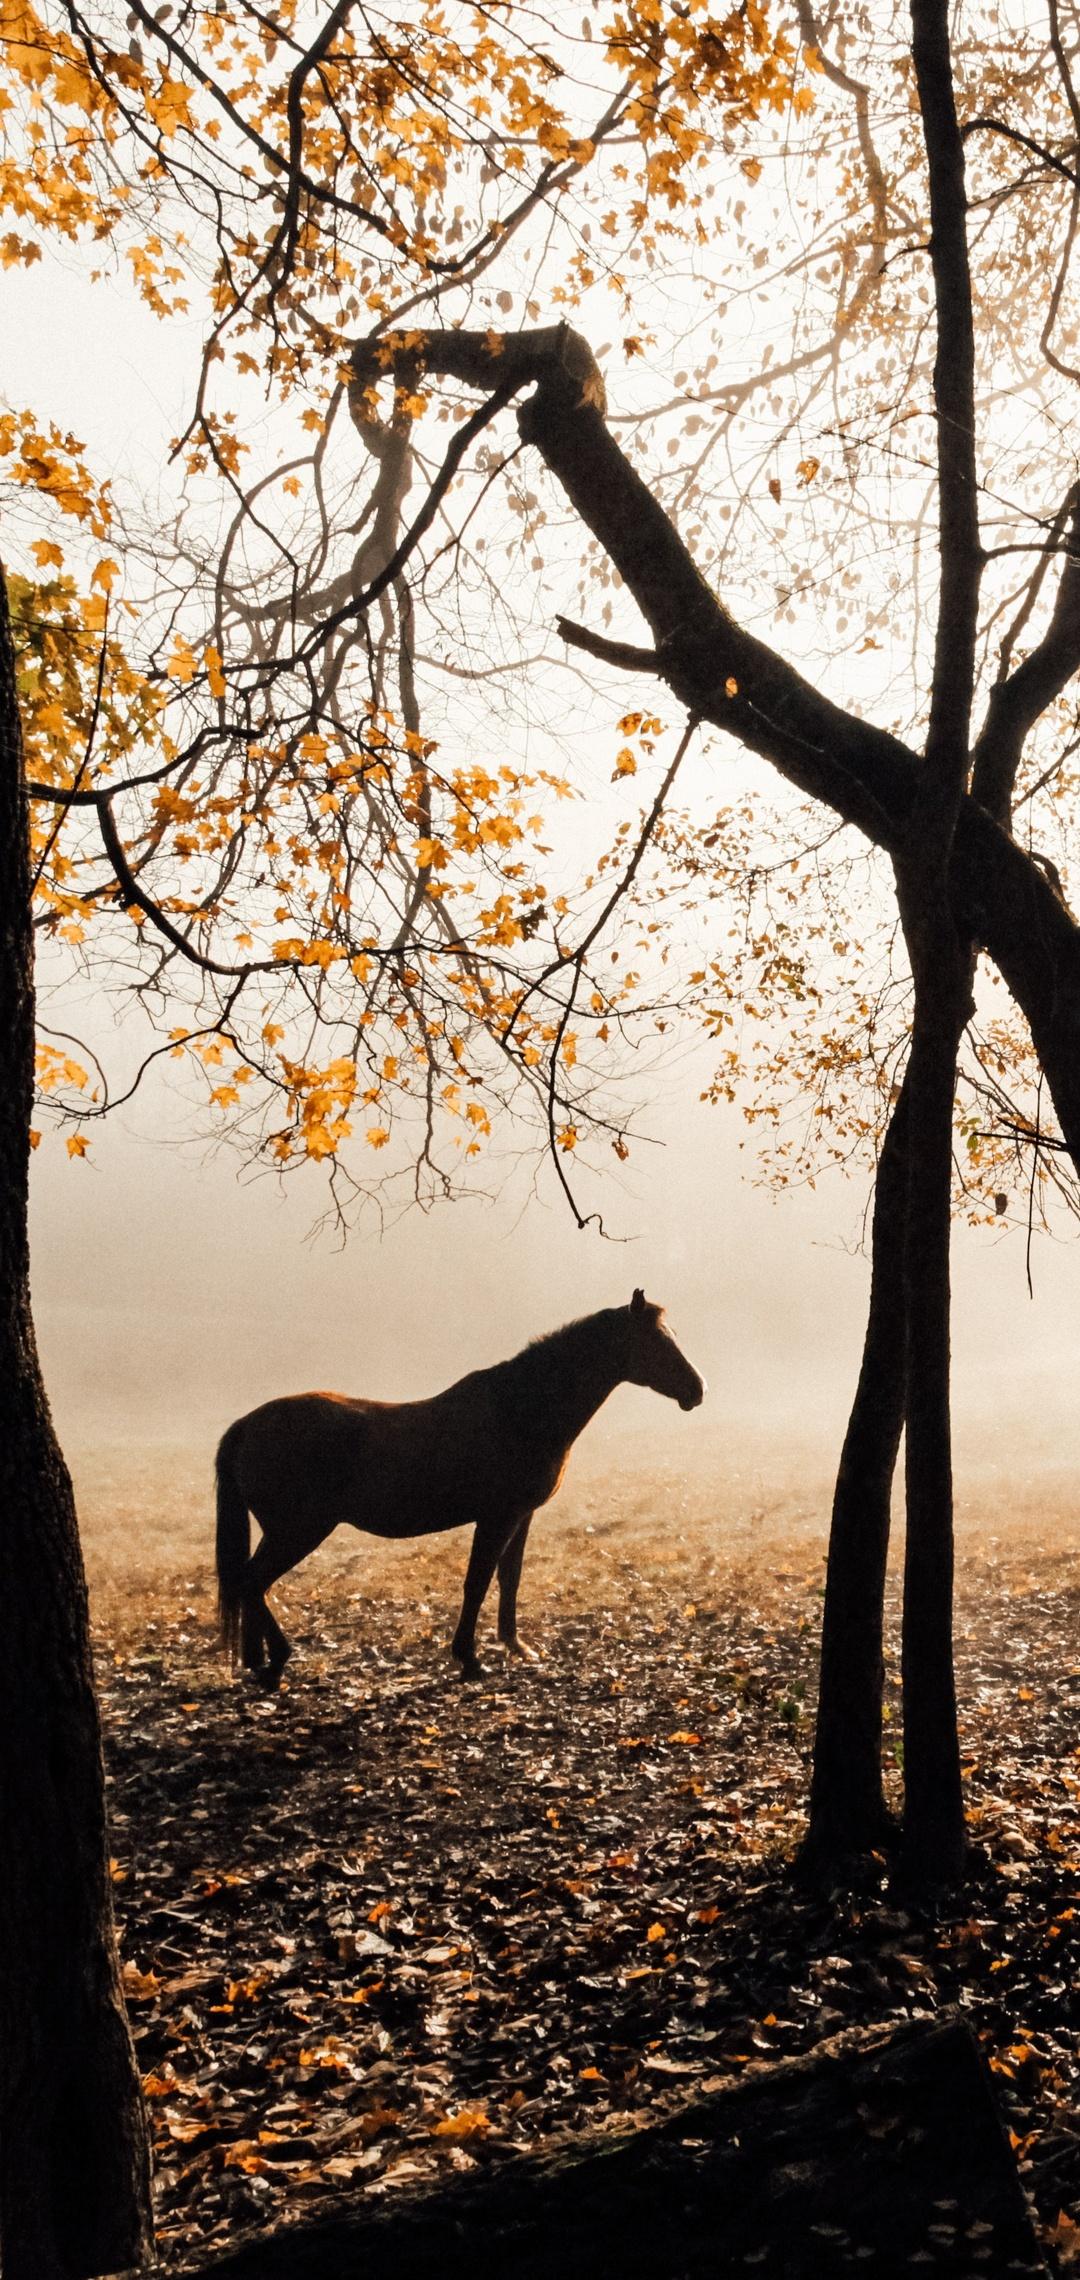 horse-sunlight-forest-photography-5k-xm.jpg